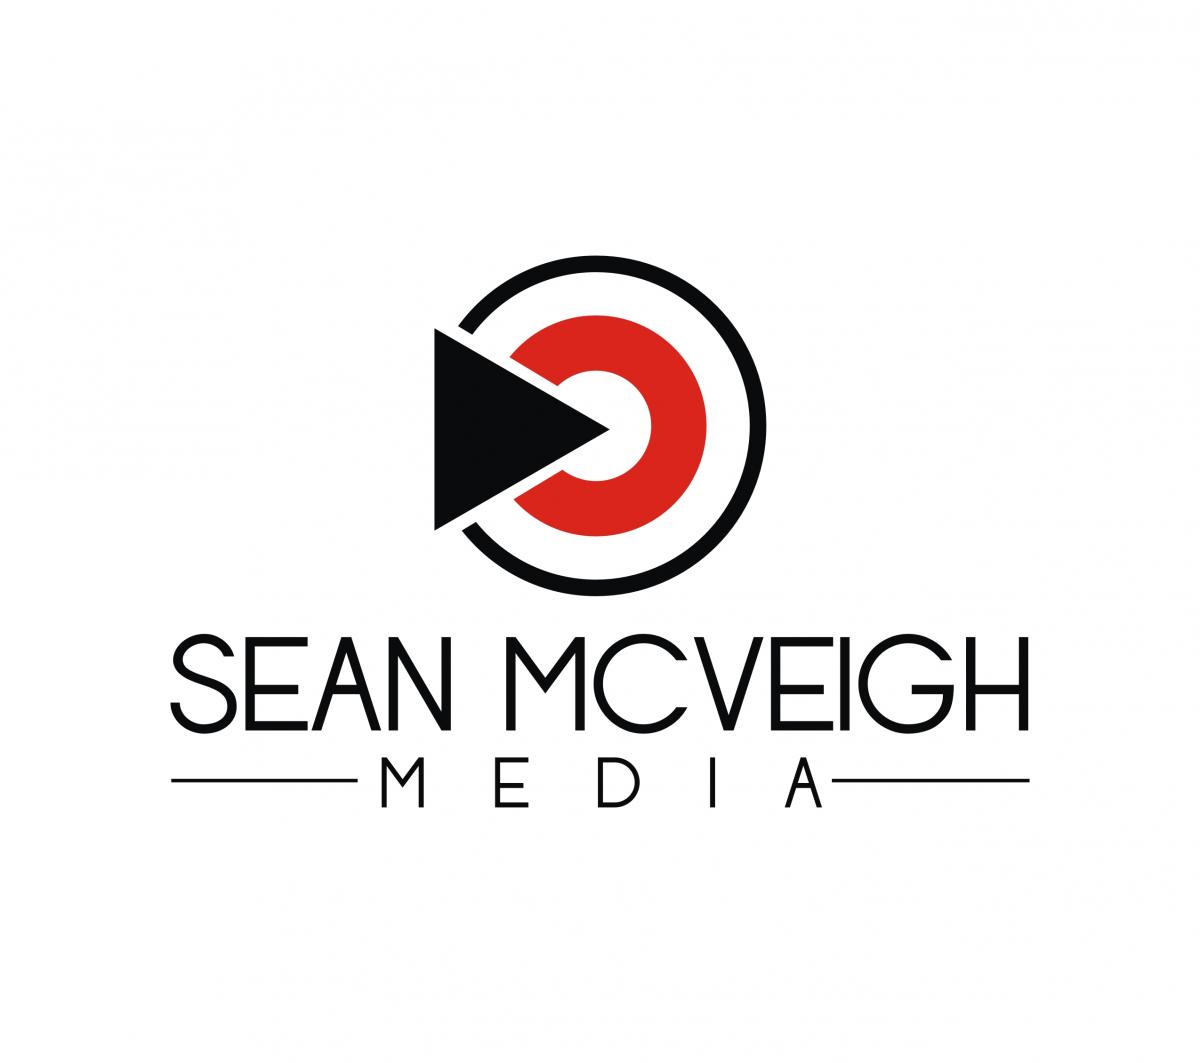 Sean McVeigh  Media